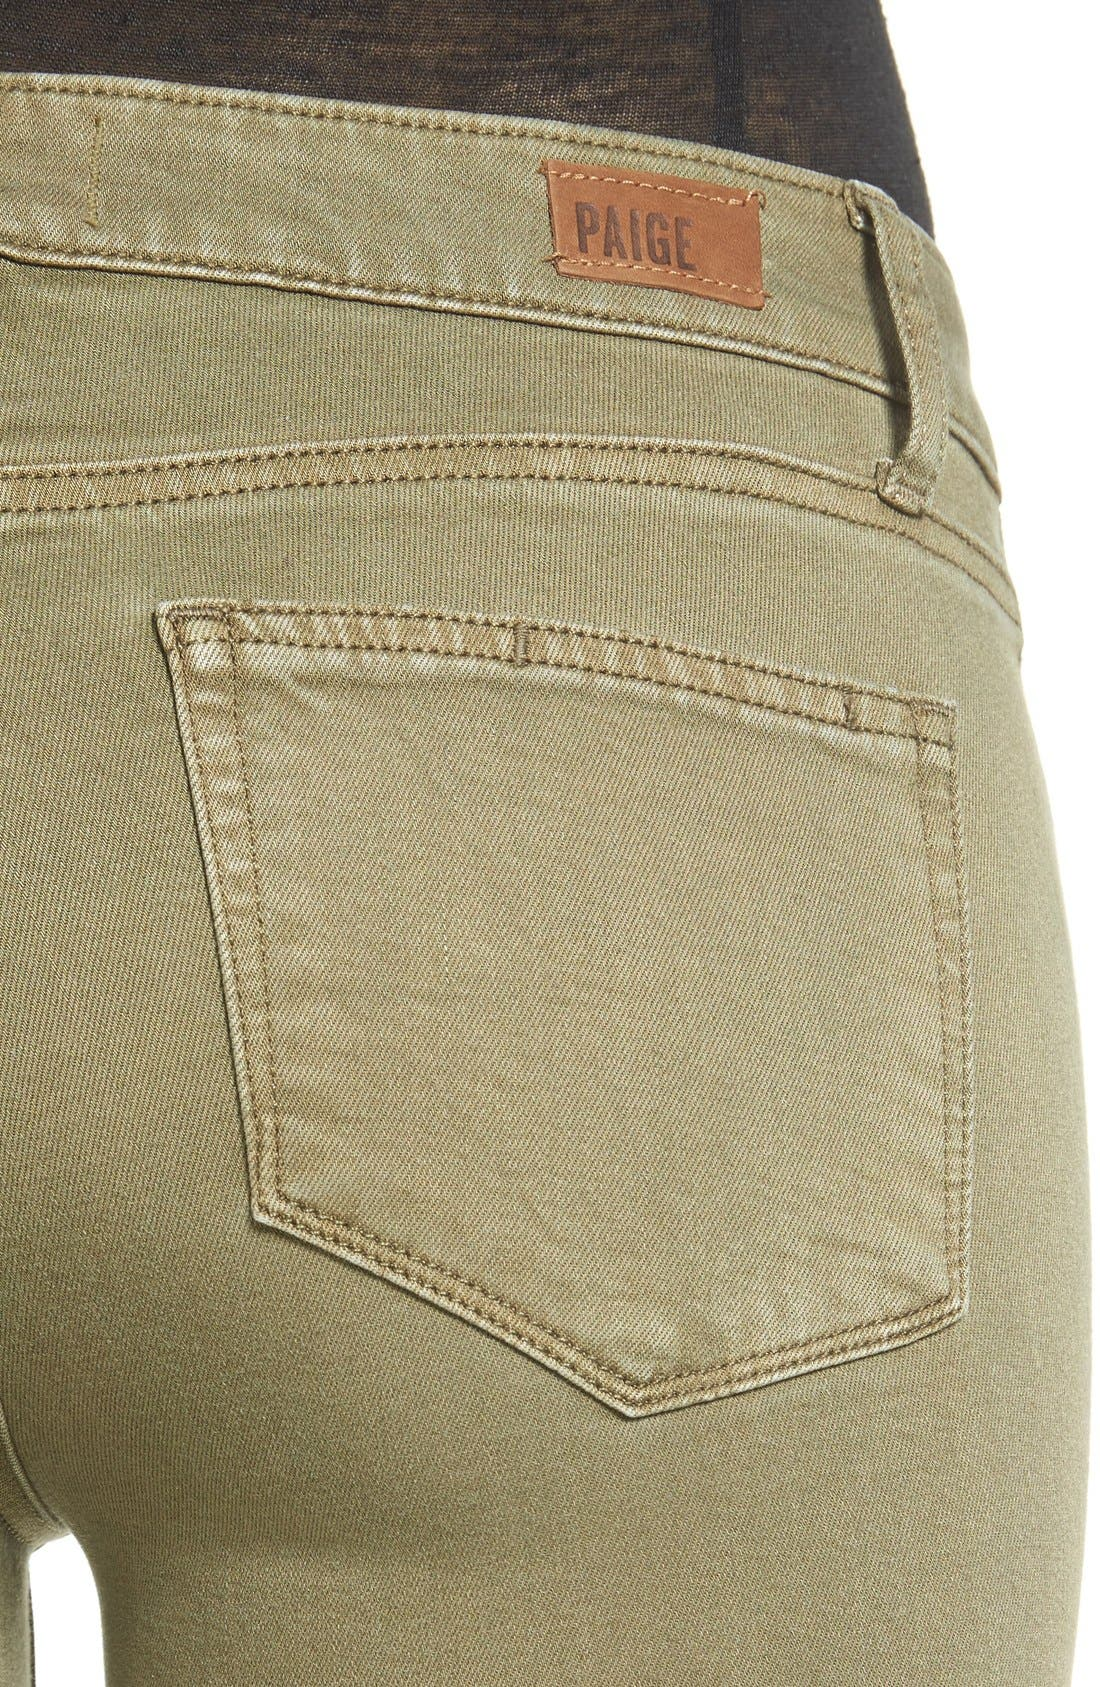 Alternate Image 3  - PAIGE Transcend - Verdugo Ankle Skinny Jeans (Sahara Green)